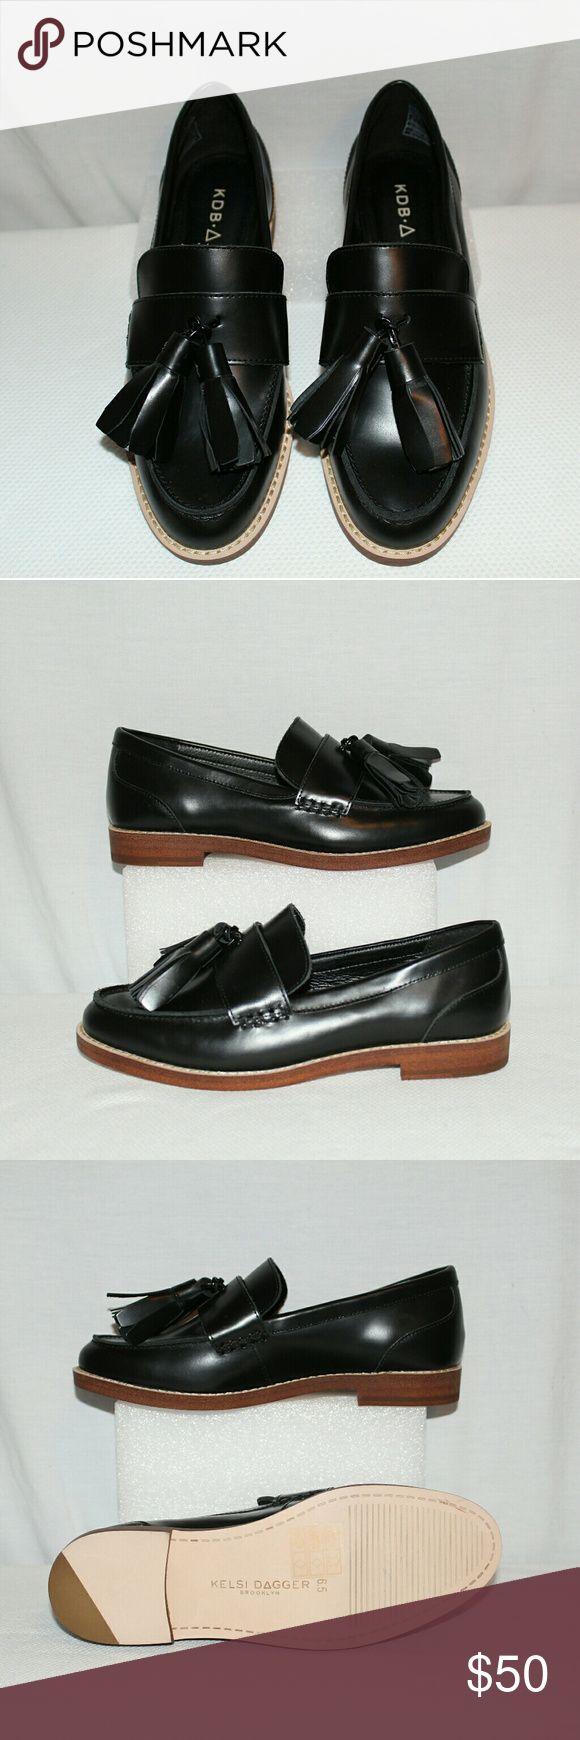 Kelsi Dagger Brooklyn Loafers. Kelsi Dagger Brooklyn Leather S Gwen Loafers, Brand new never worn,  clean upper leather,  clean soles, ready to wear. kelsi Dagger Brooklyn  Shoes Flats & Loafers